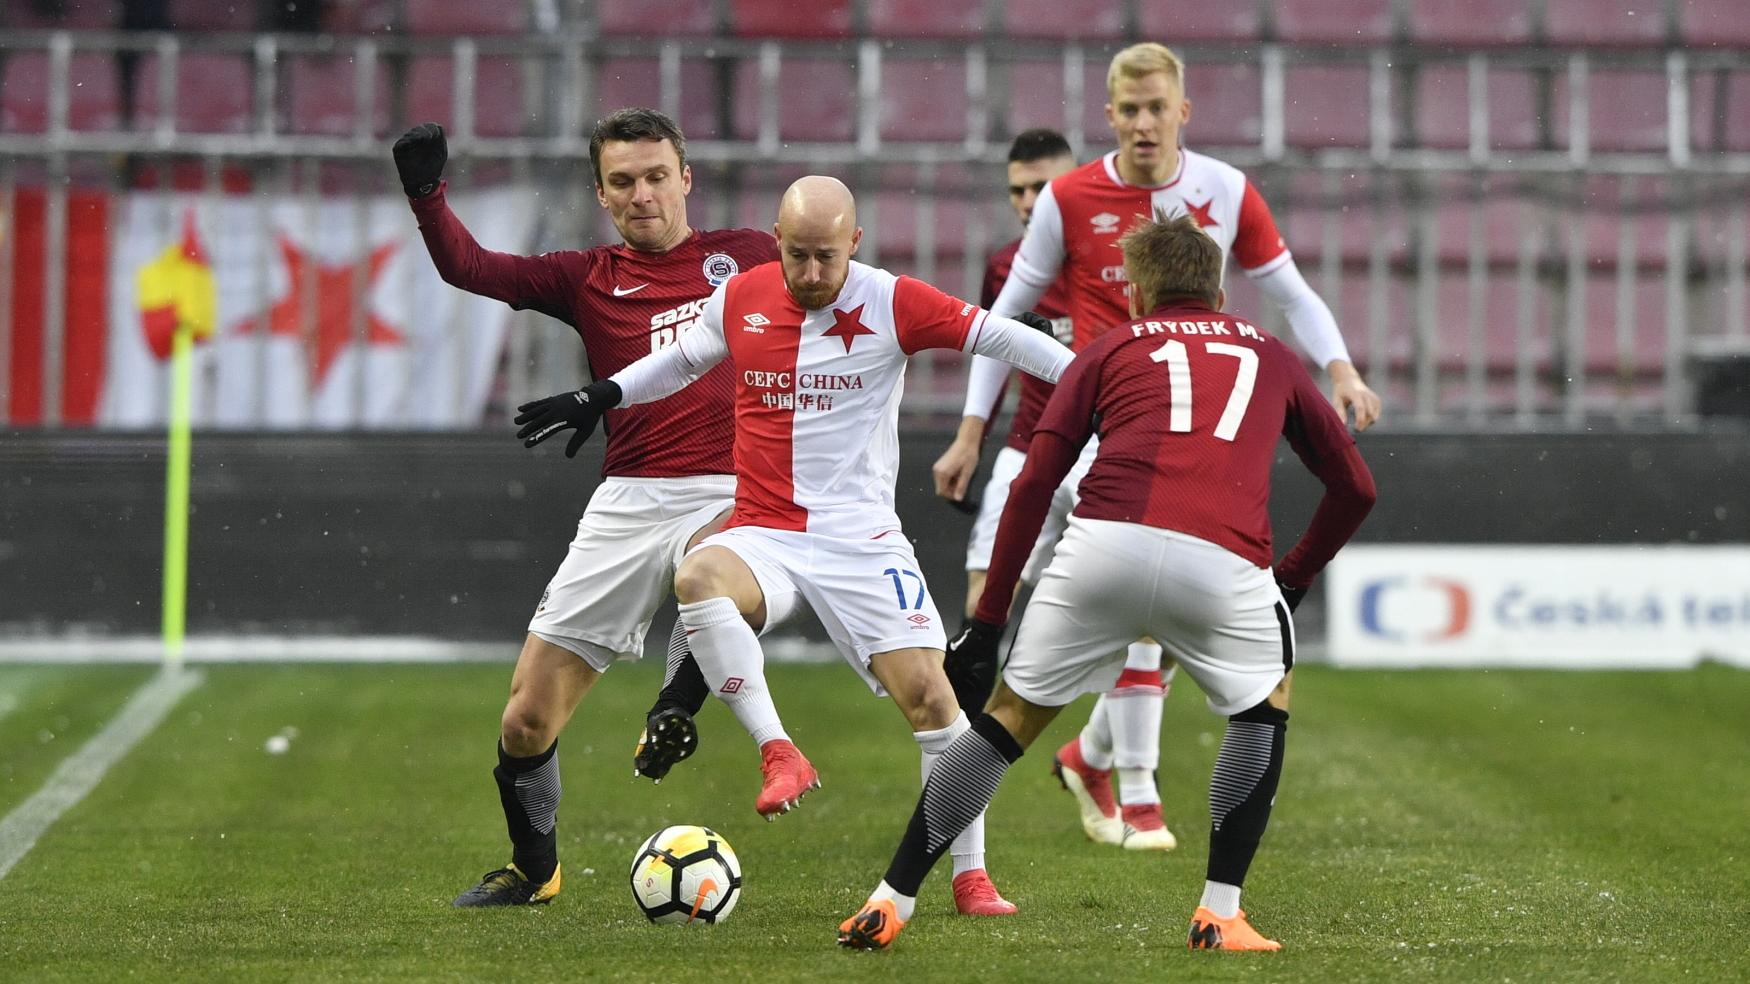 Fotbal Slavia Pinterest: Sparta-Slavia, Le Premier « Vidéo Derby » De L'histoire